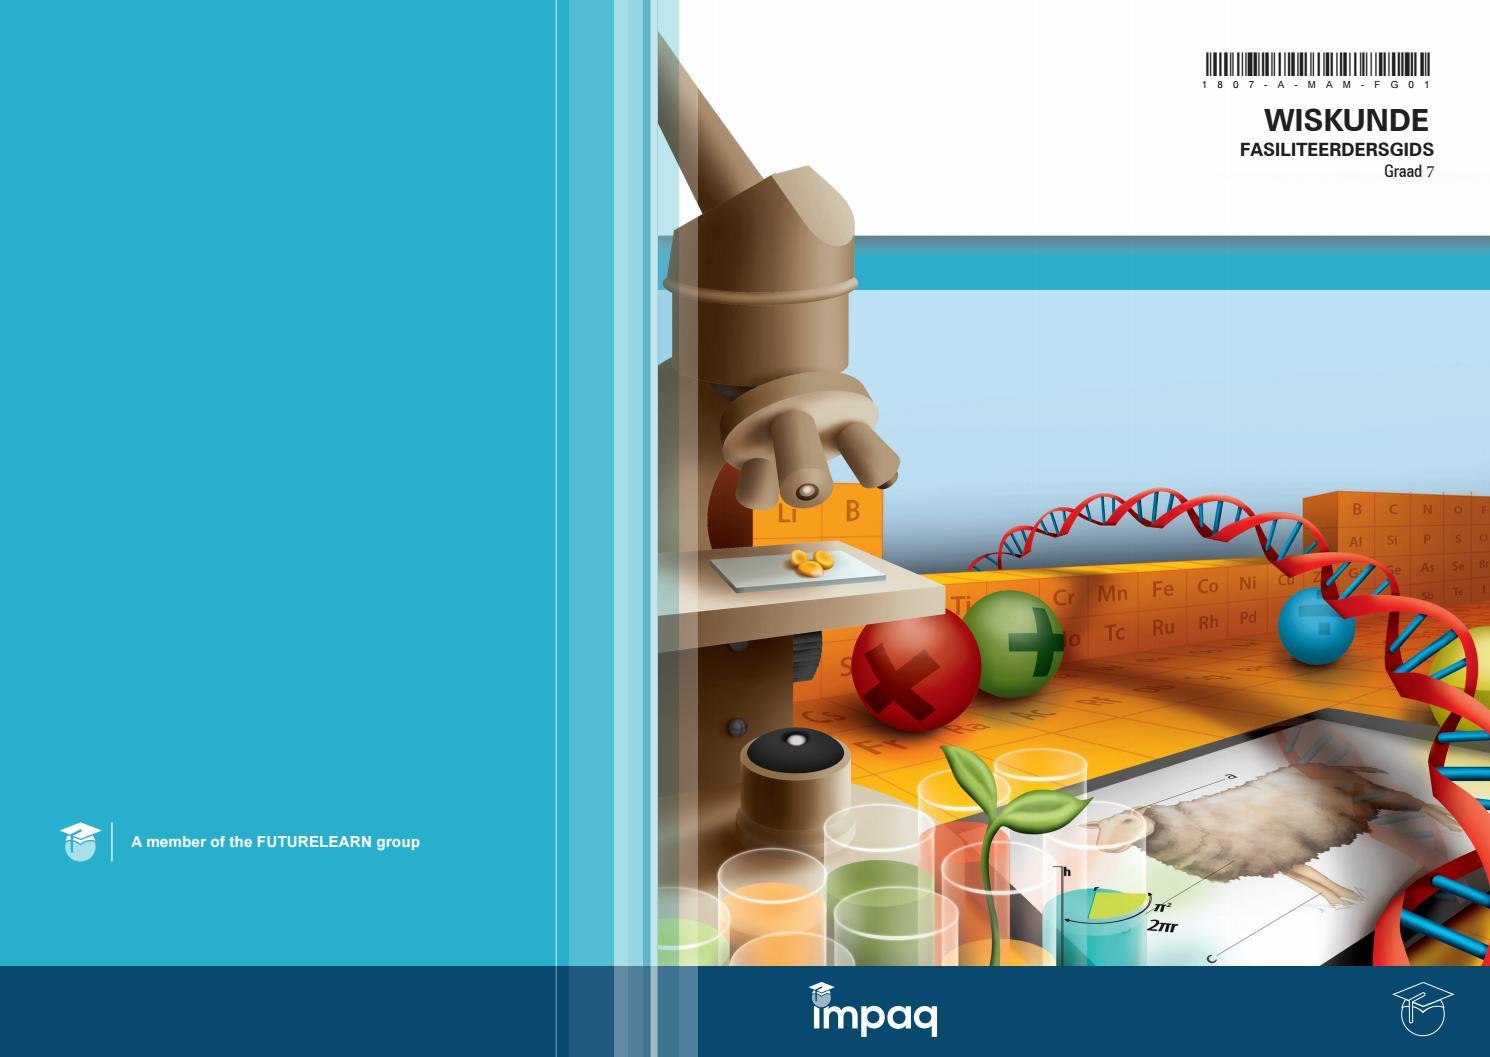 Gr 7 wiskunde fasiliteerdersgids by Impaq - issuu